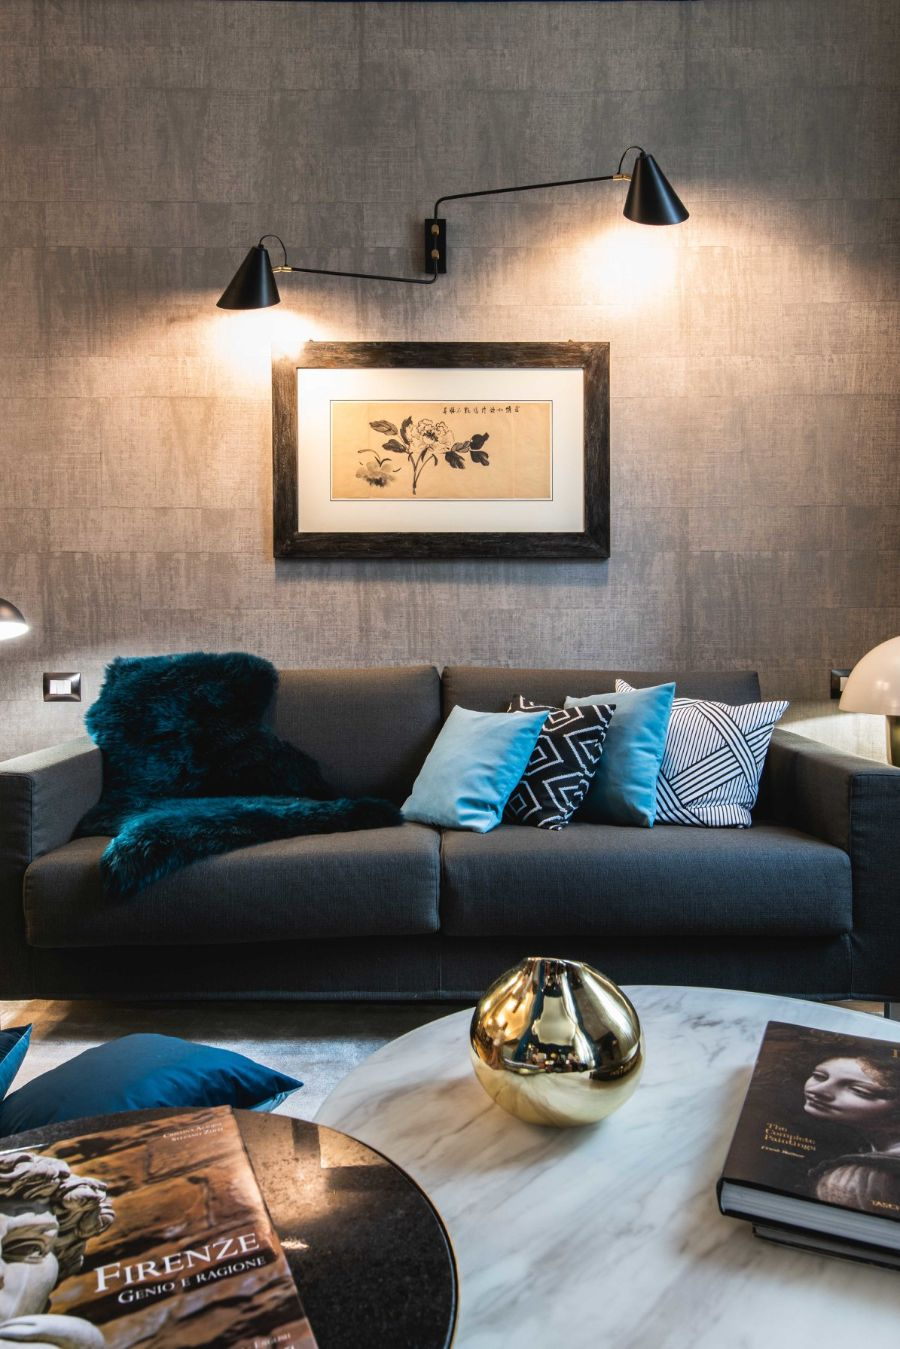 interni e design via giovanni amendola,, 8 firenze (fi) 0 recensioni verificate Be Inspired By 20 Of The Best Interior Designers From Florence